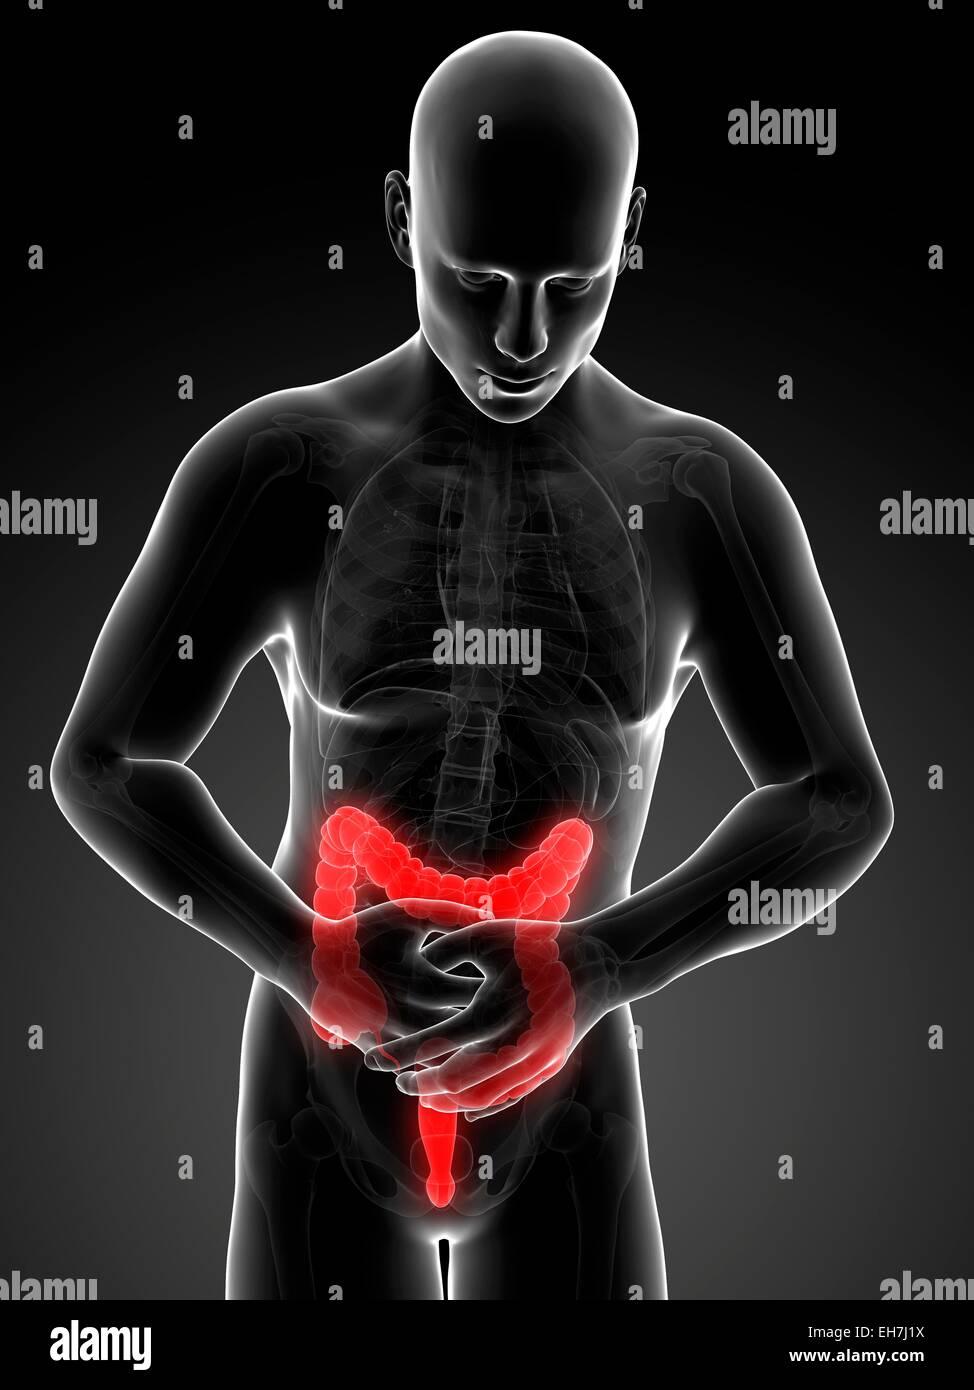 Human large intestine pain illustration stock photo 79458454 alamy human large intestine pain illustration ccuart Choice Image